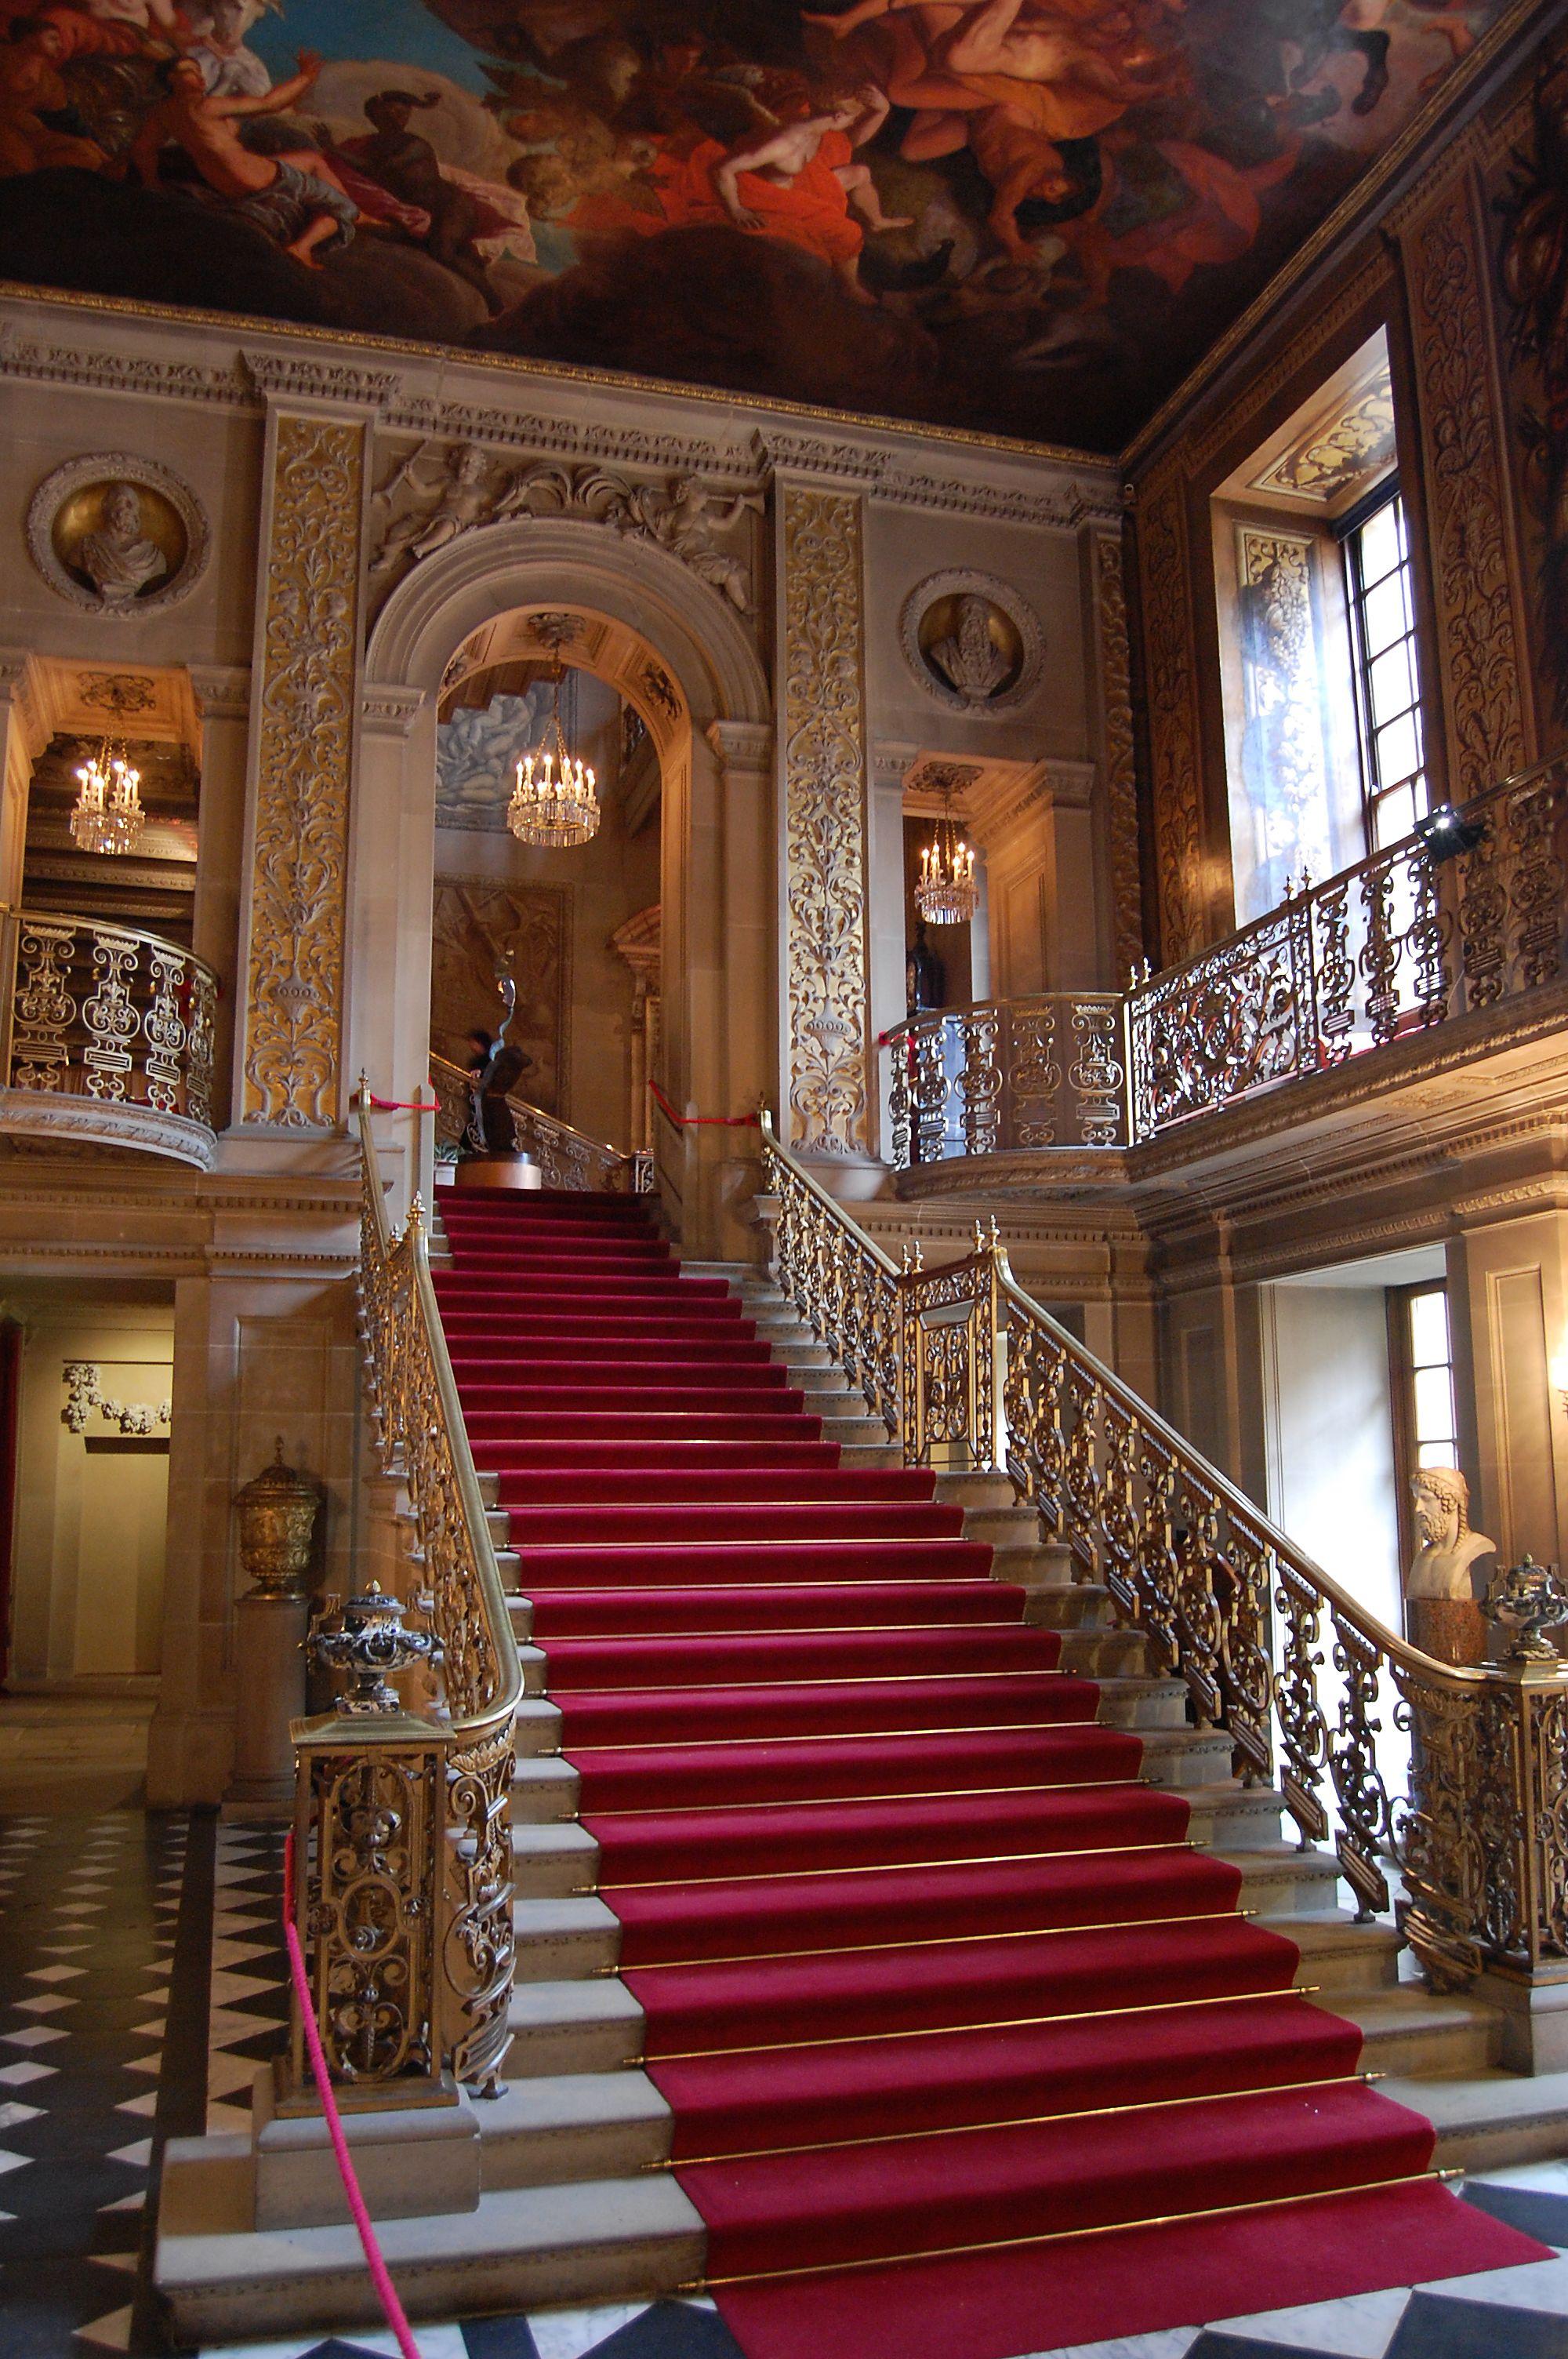 5b7c51340f19c799d442dff31963c4a5 - How Much Is It To Get Into Chatsworth House